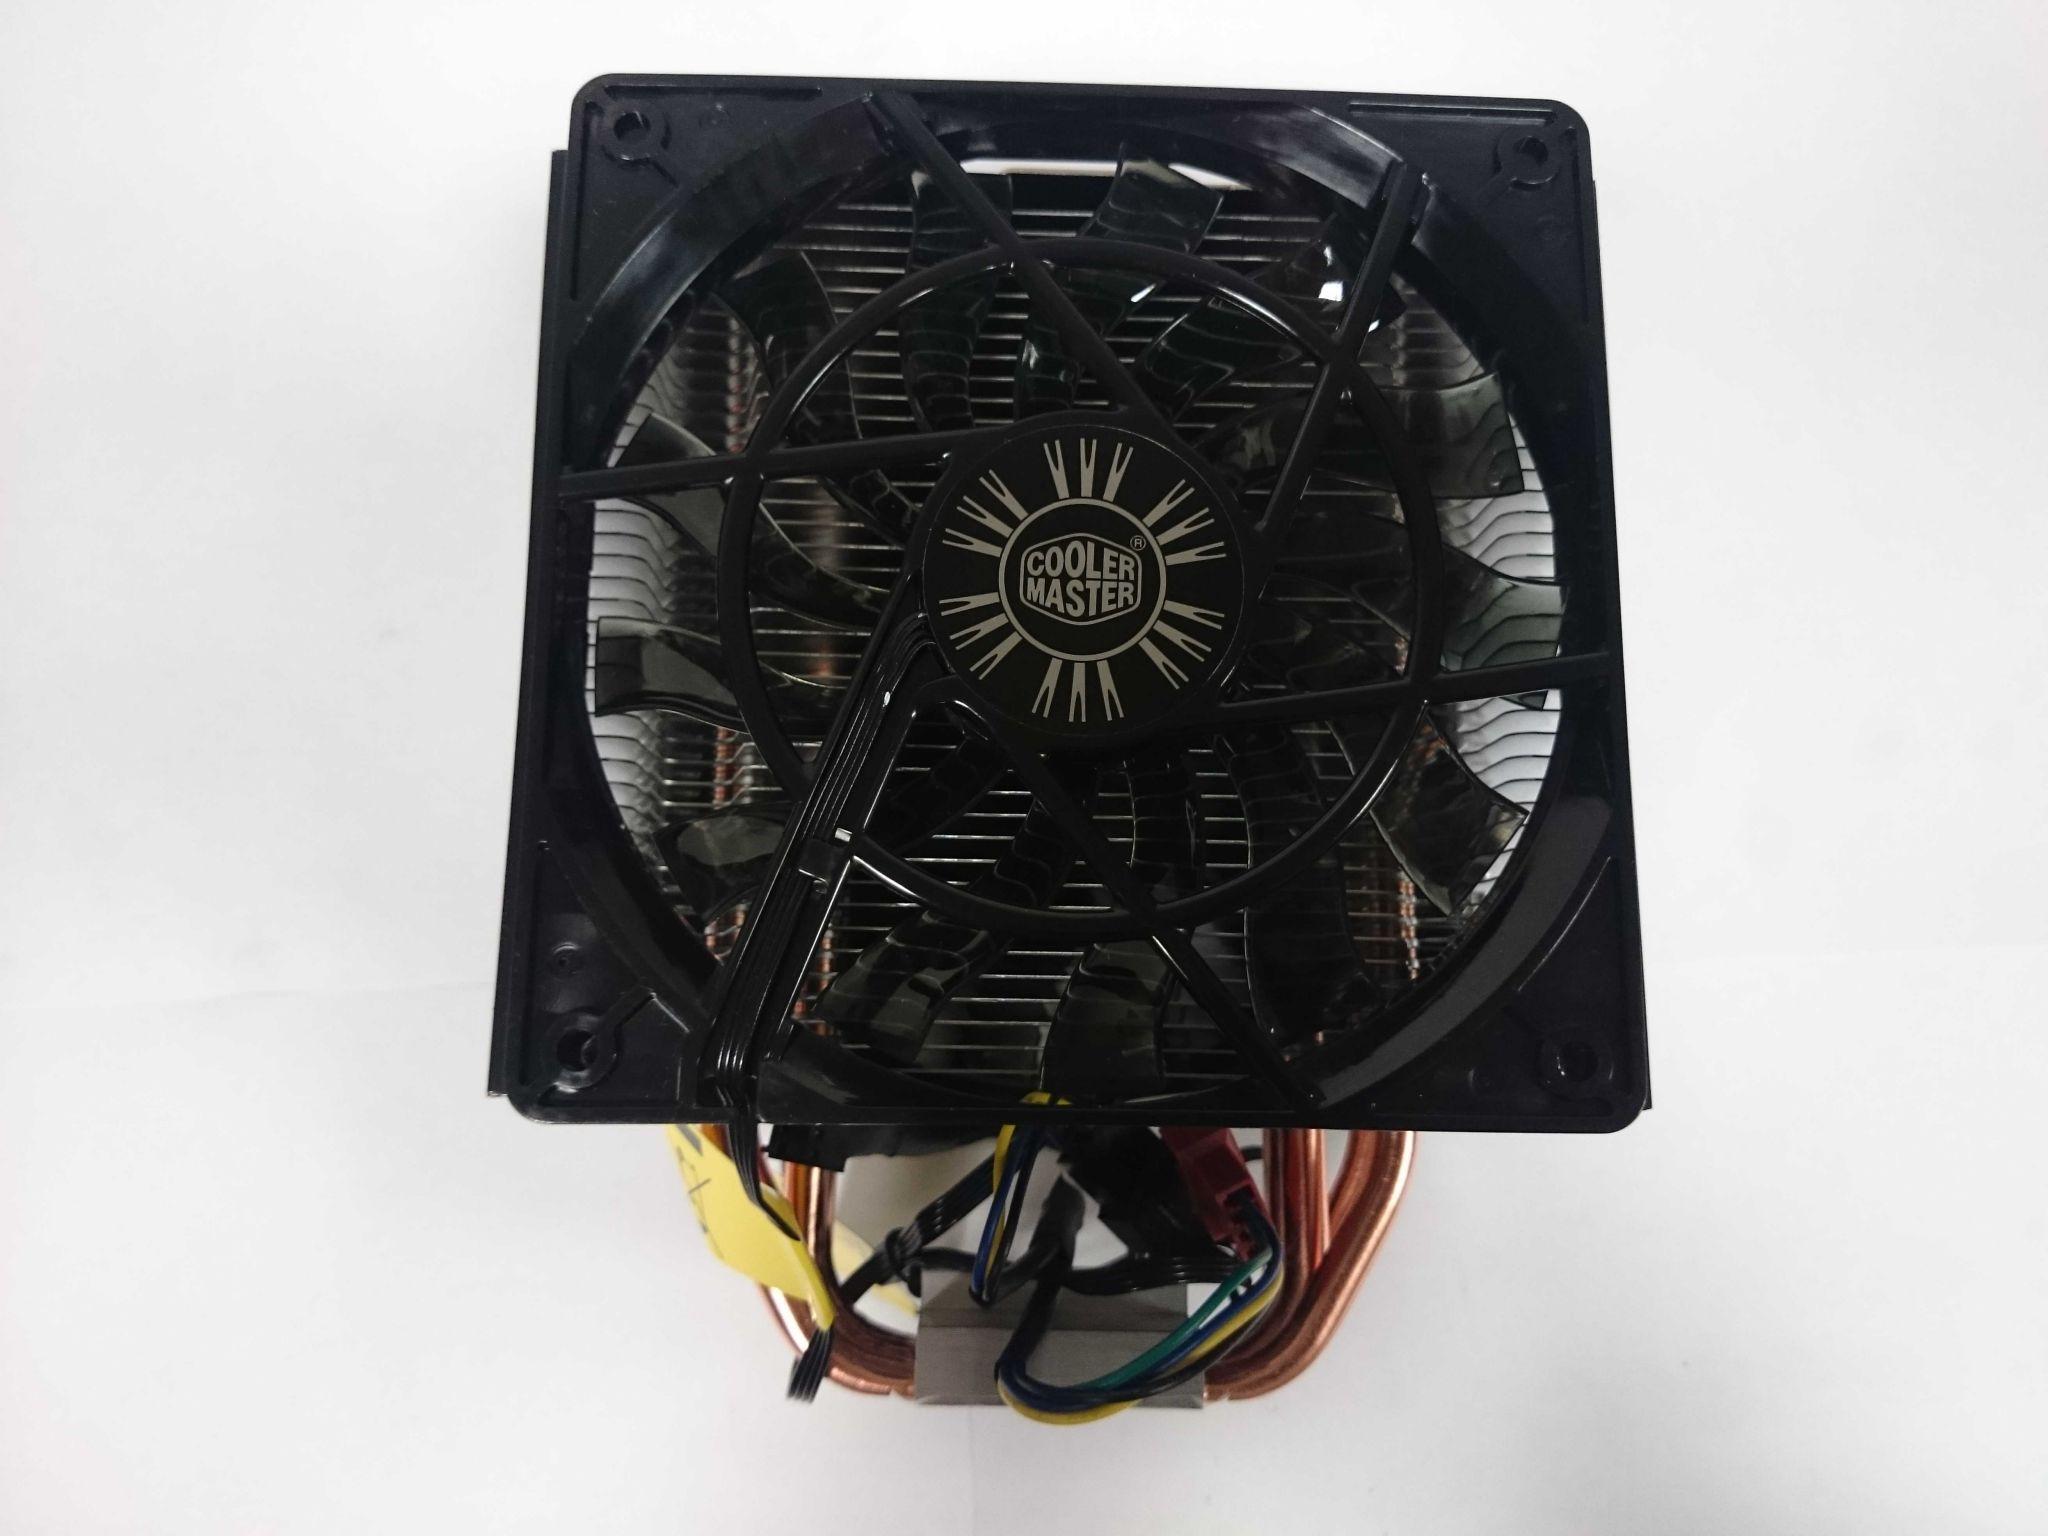 Dissipatore Cpu Cooler Hyper CMY412 Slim LGA1155 Cooler Mast